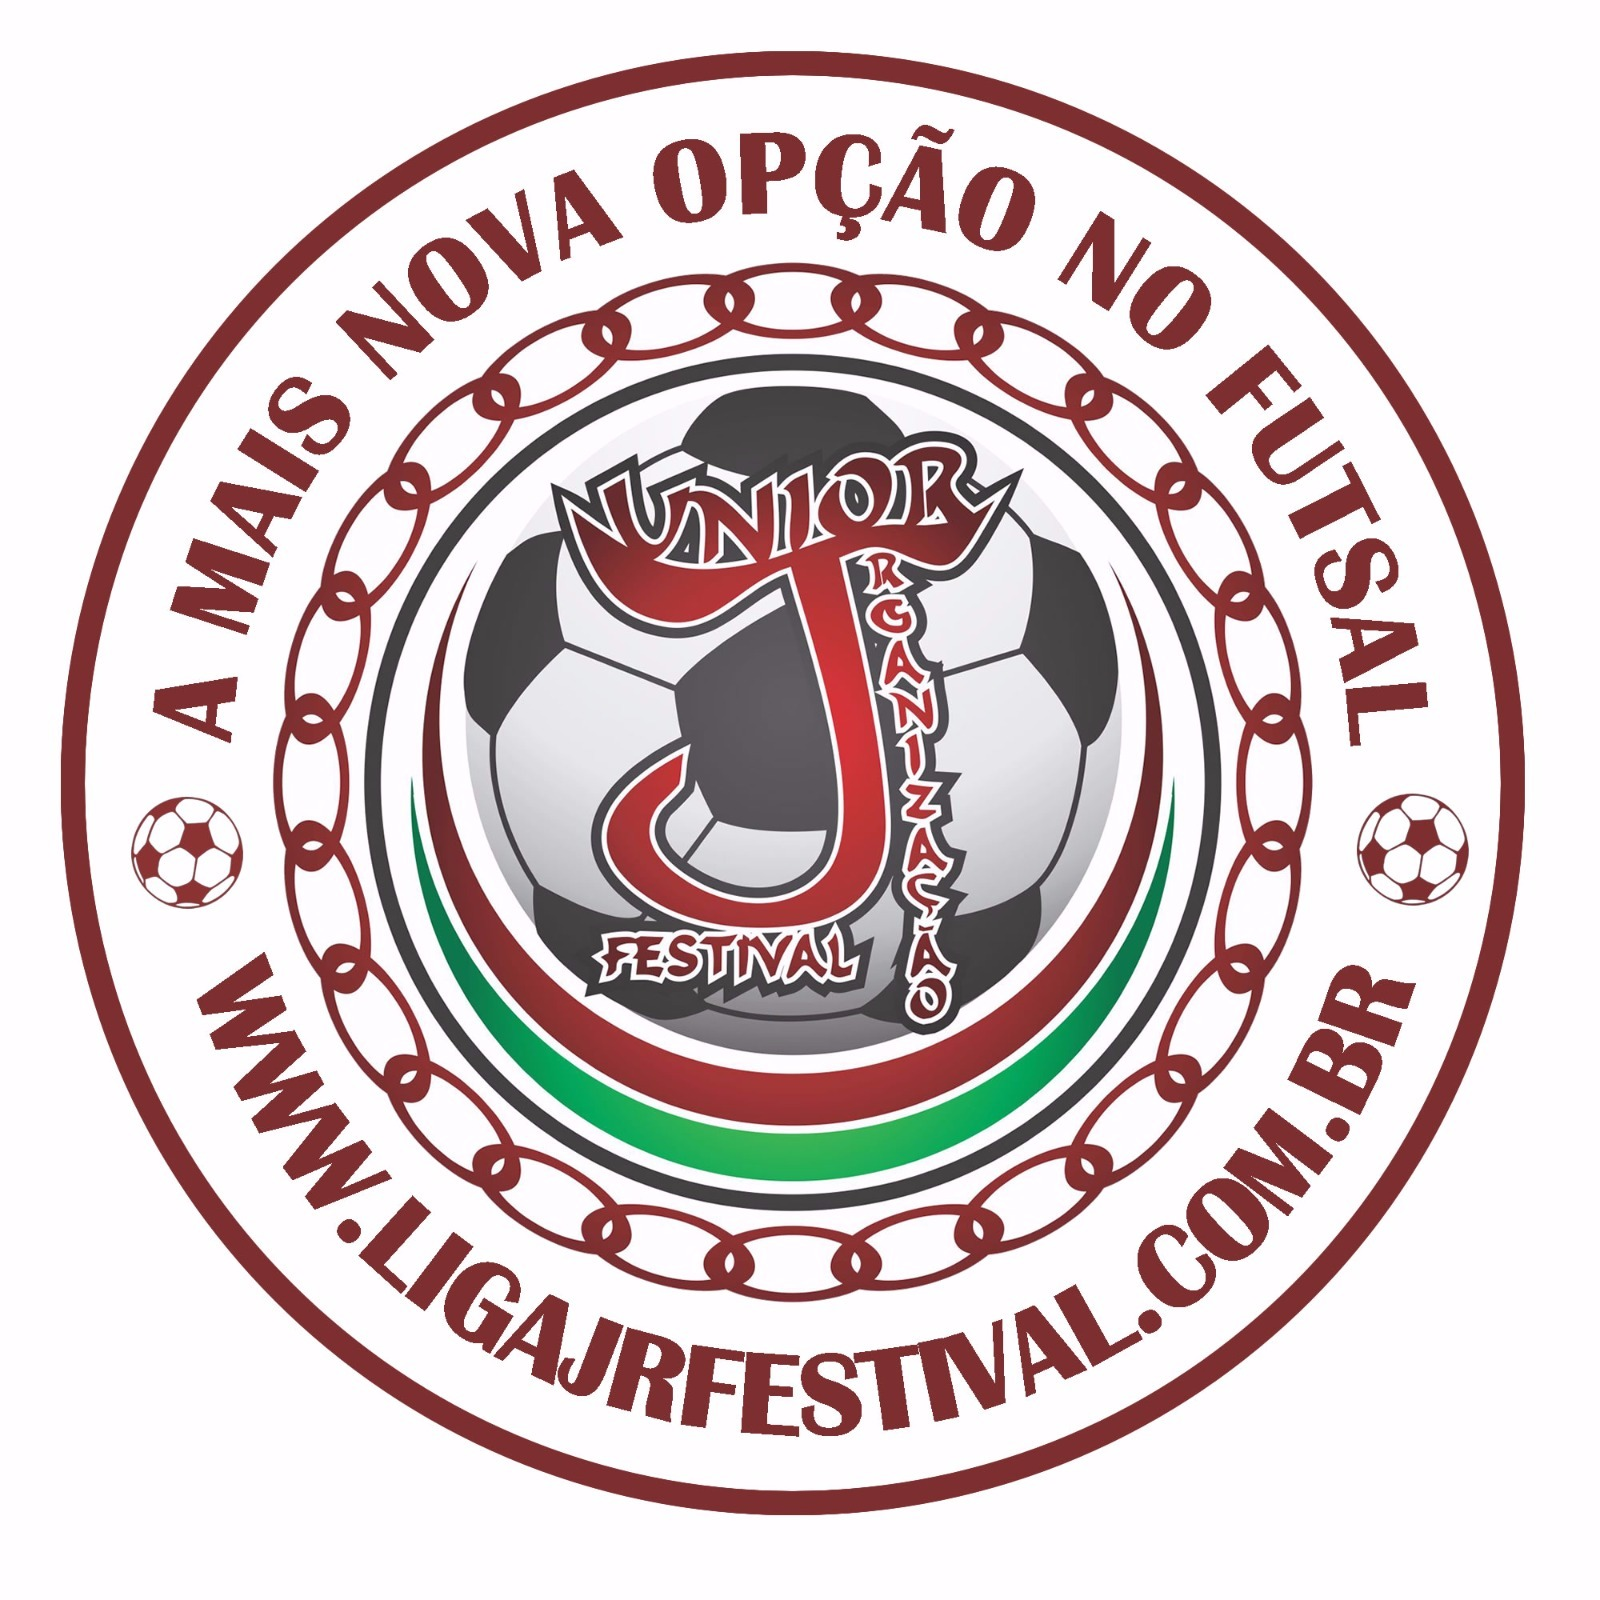 (c) Jrfestival.com.br